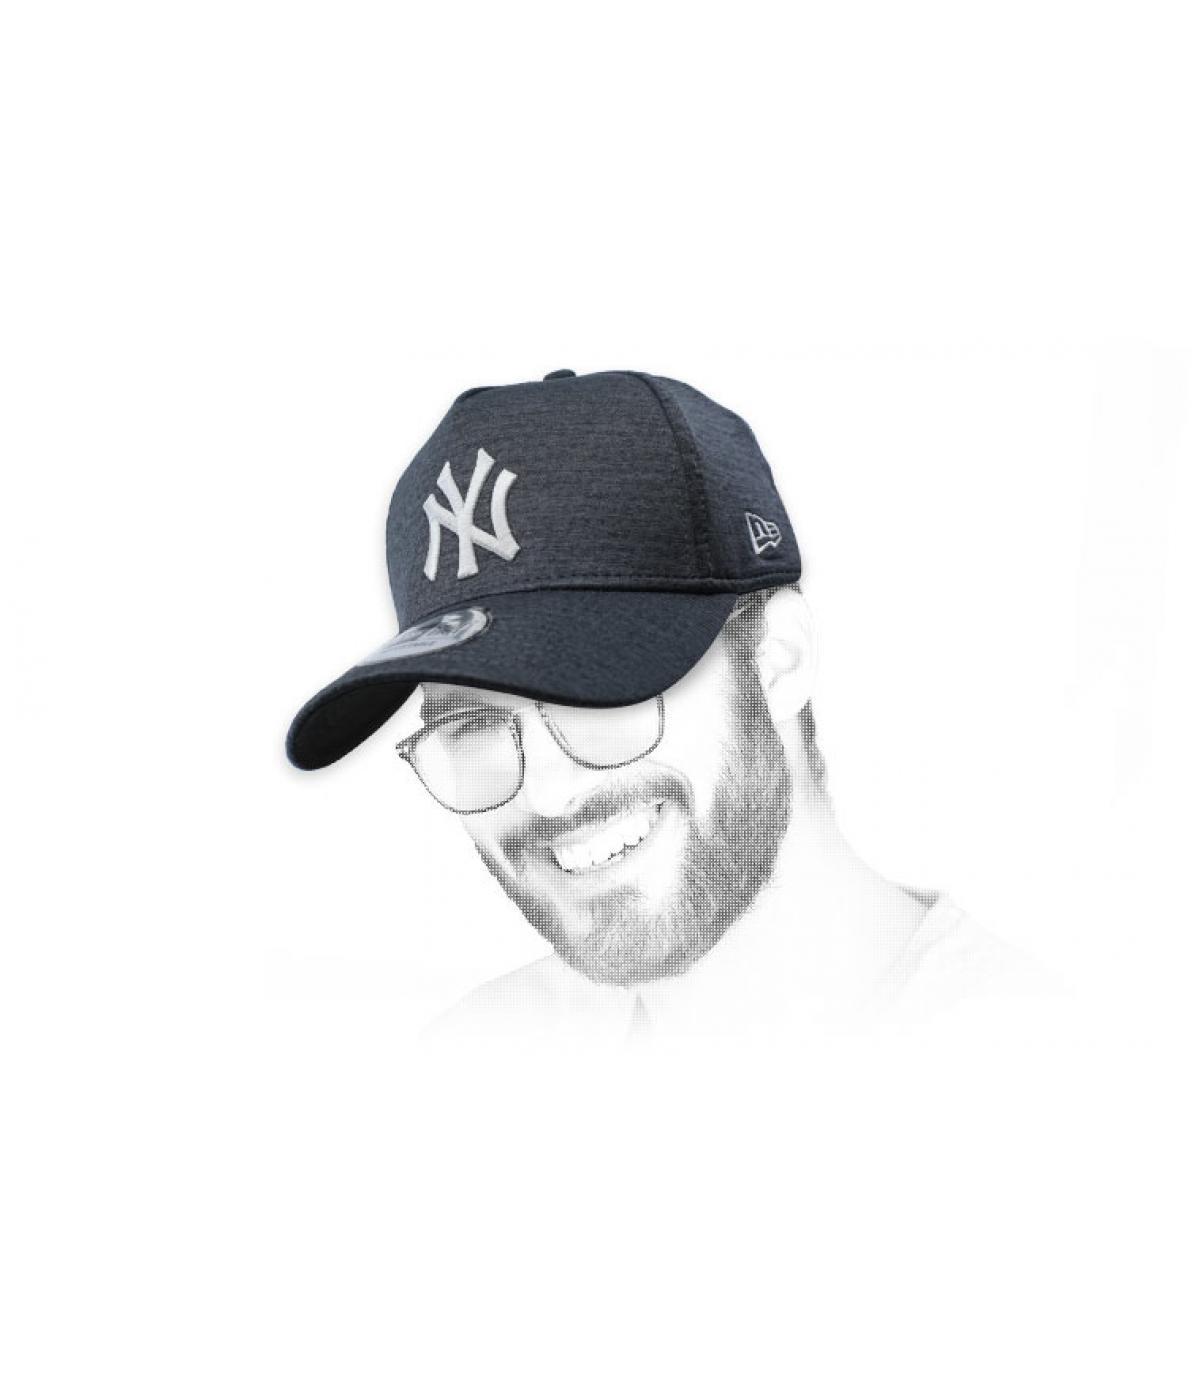 gorra NY negro gris Aframe